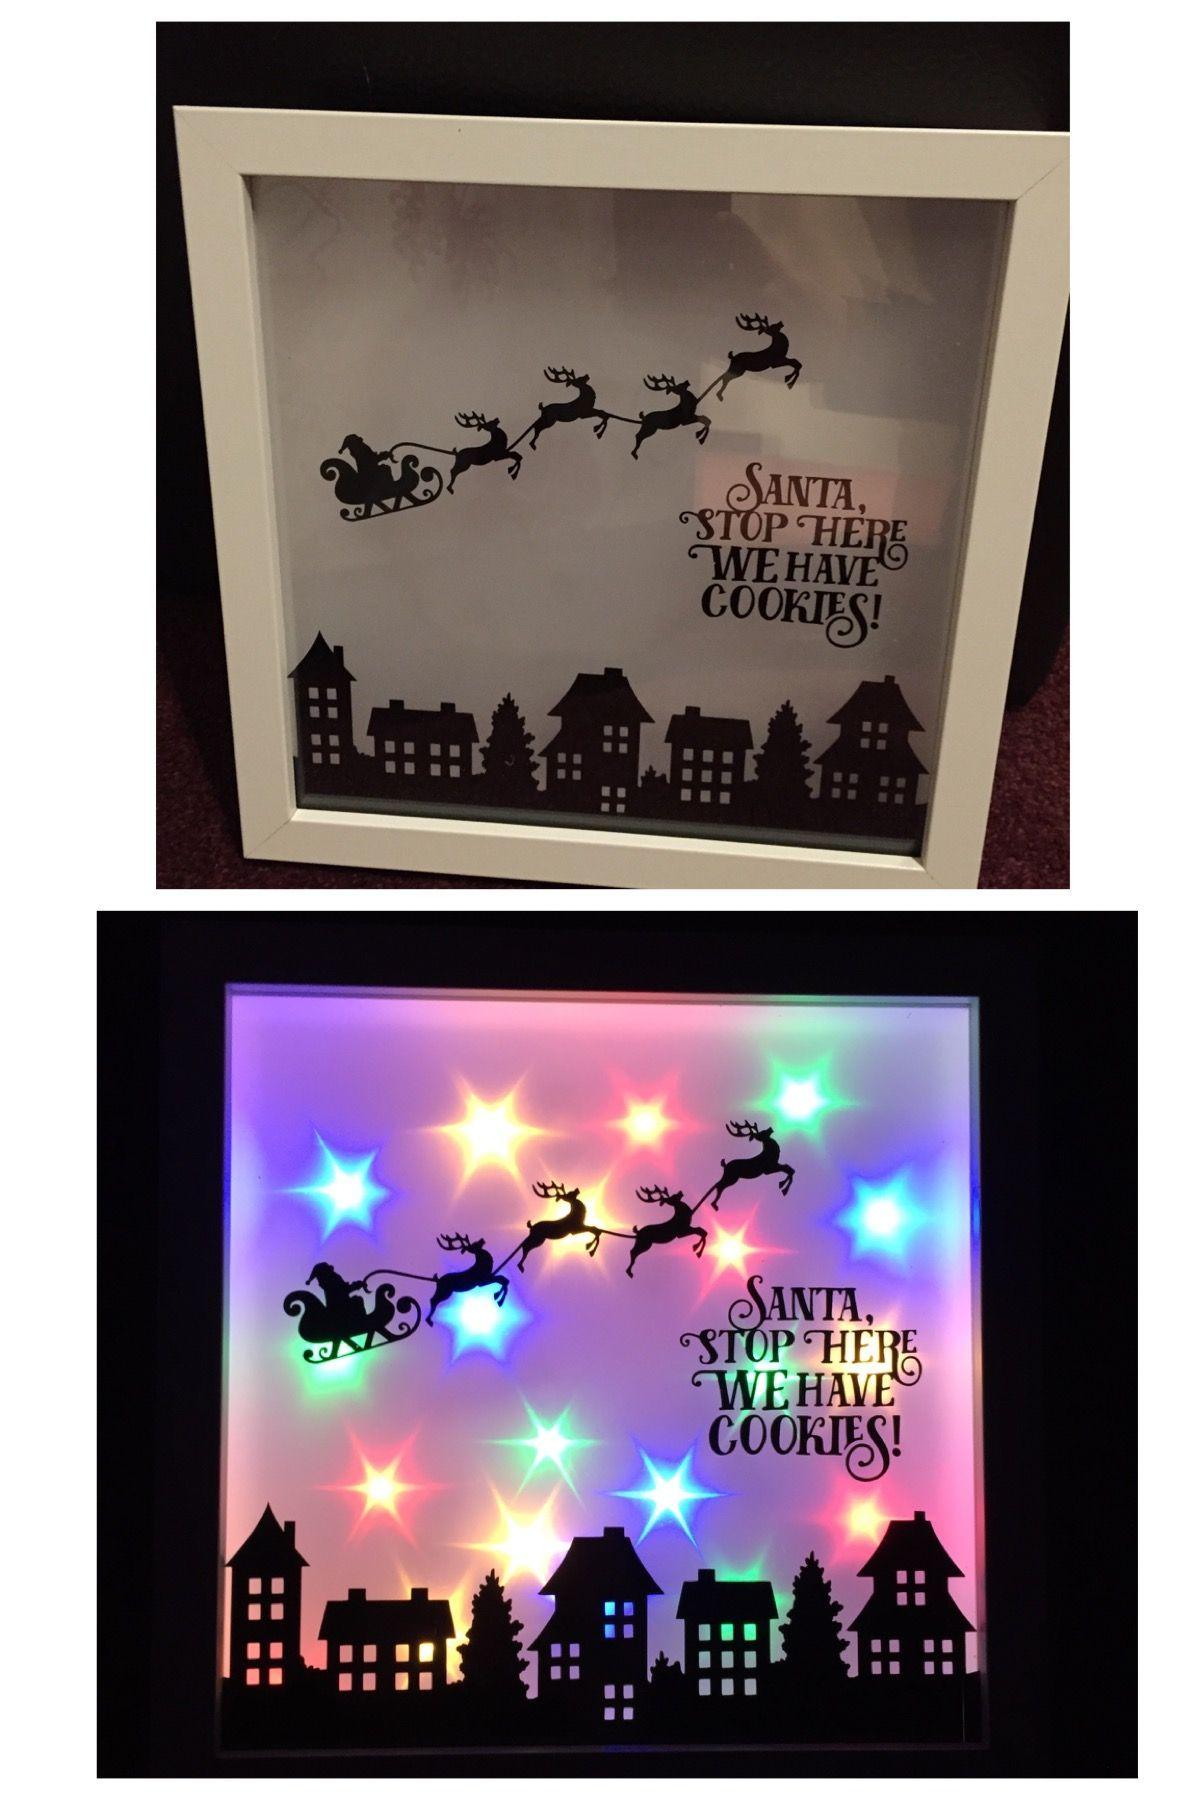 Ribba Ikea Christmas Weihnachten ikeachristmas christmasframes ...